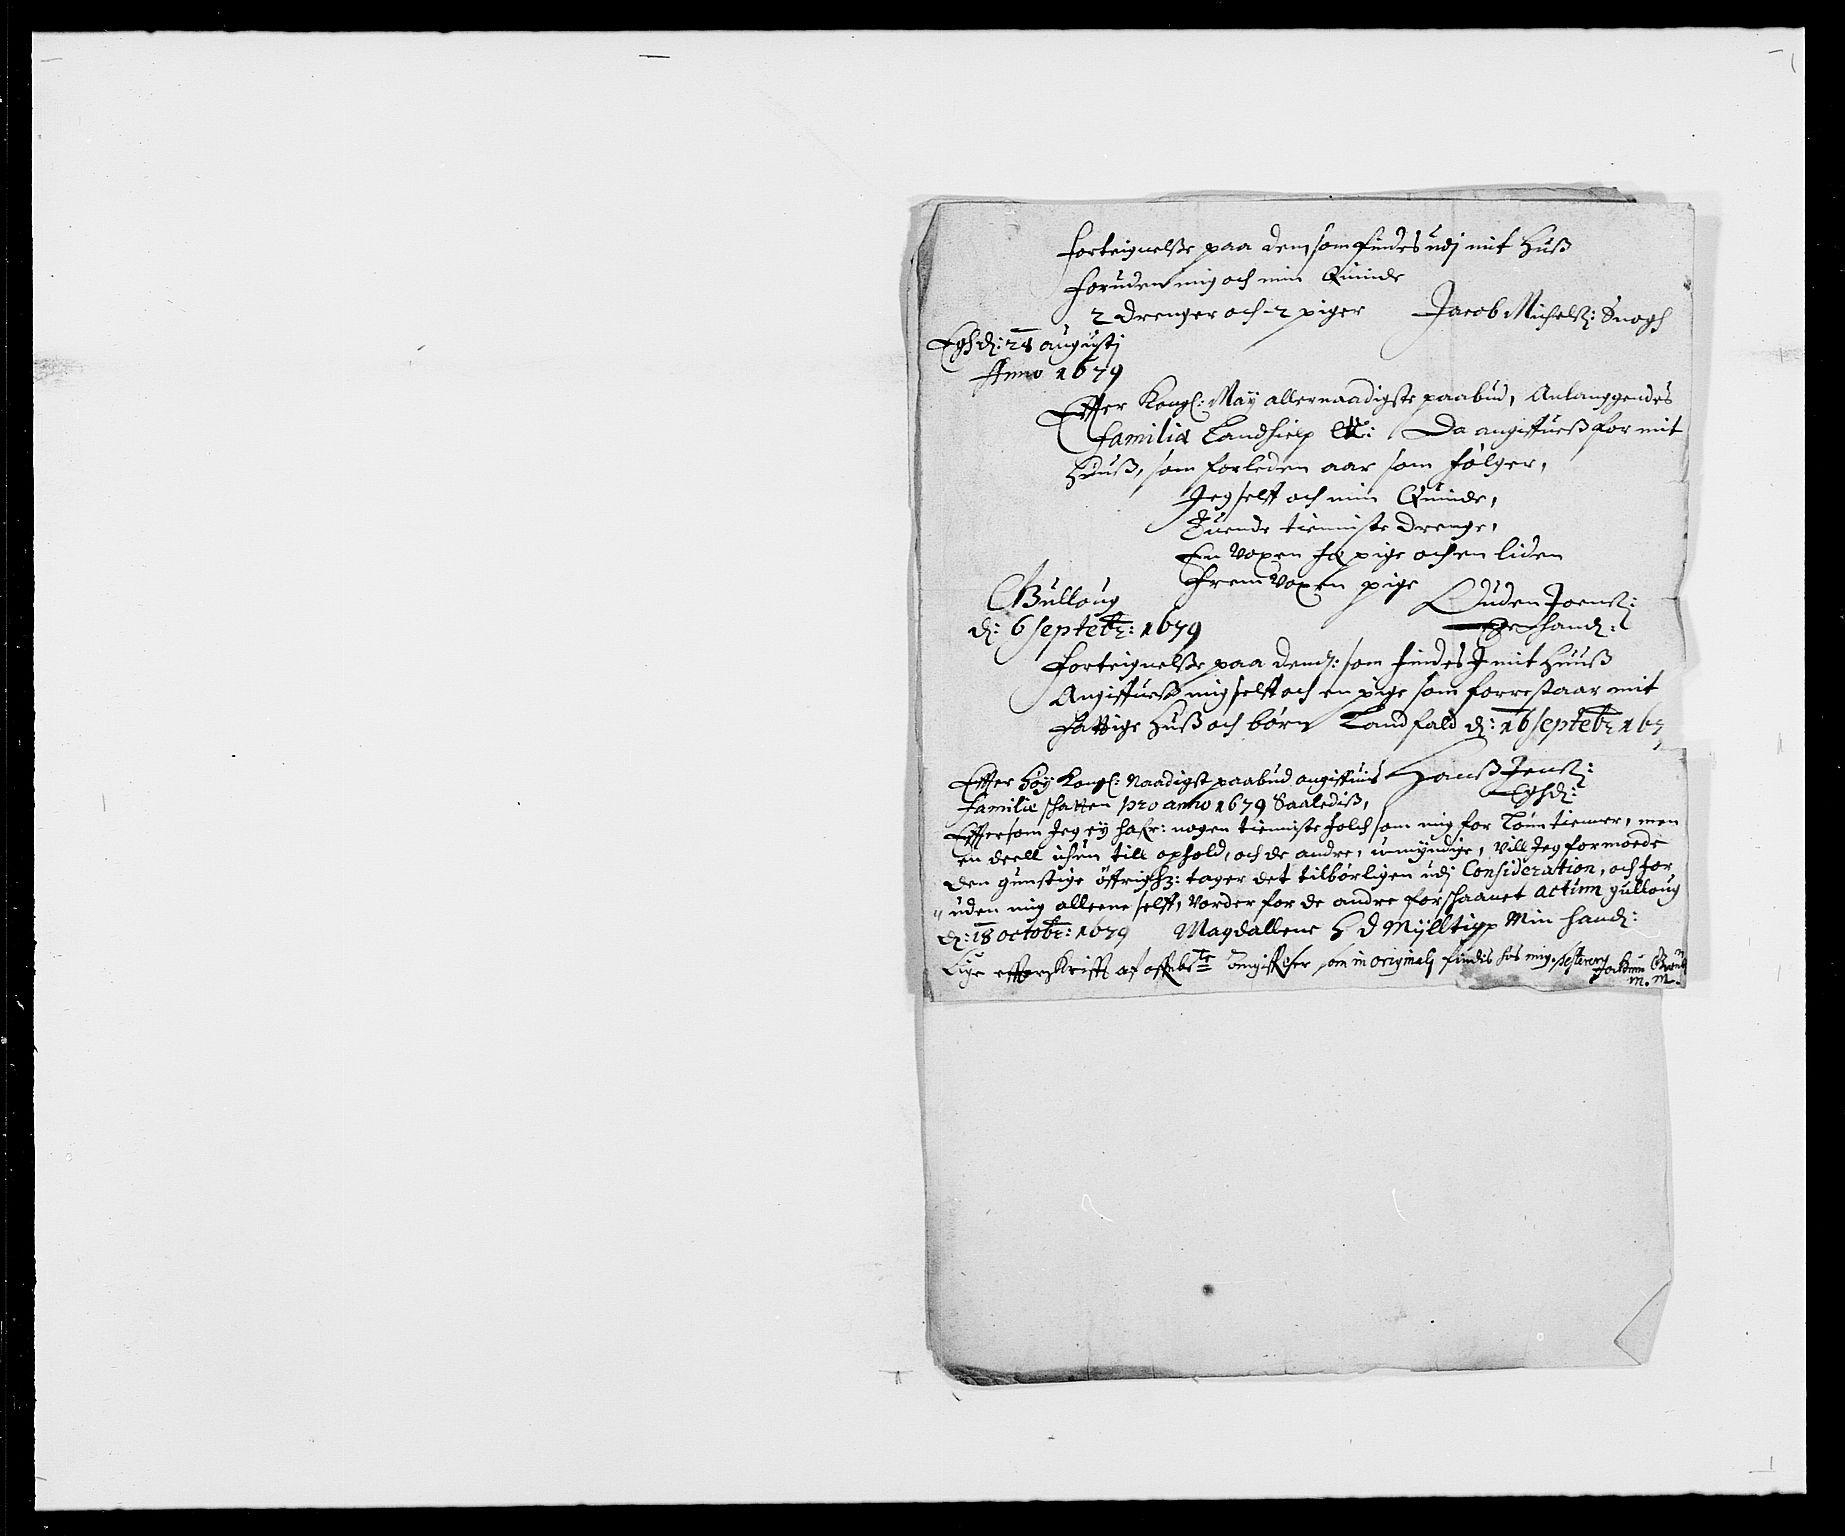 RA, Rentekammeret inntil 1814, Reviderte regnskaper, Fogderegnskap, R27/L1686: Fogderegnskap Lier, 1678-1686, s. 182